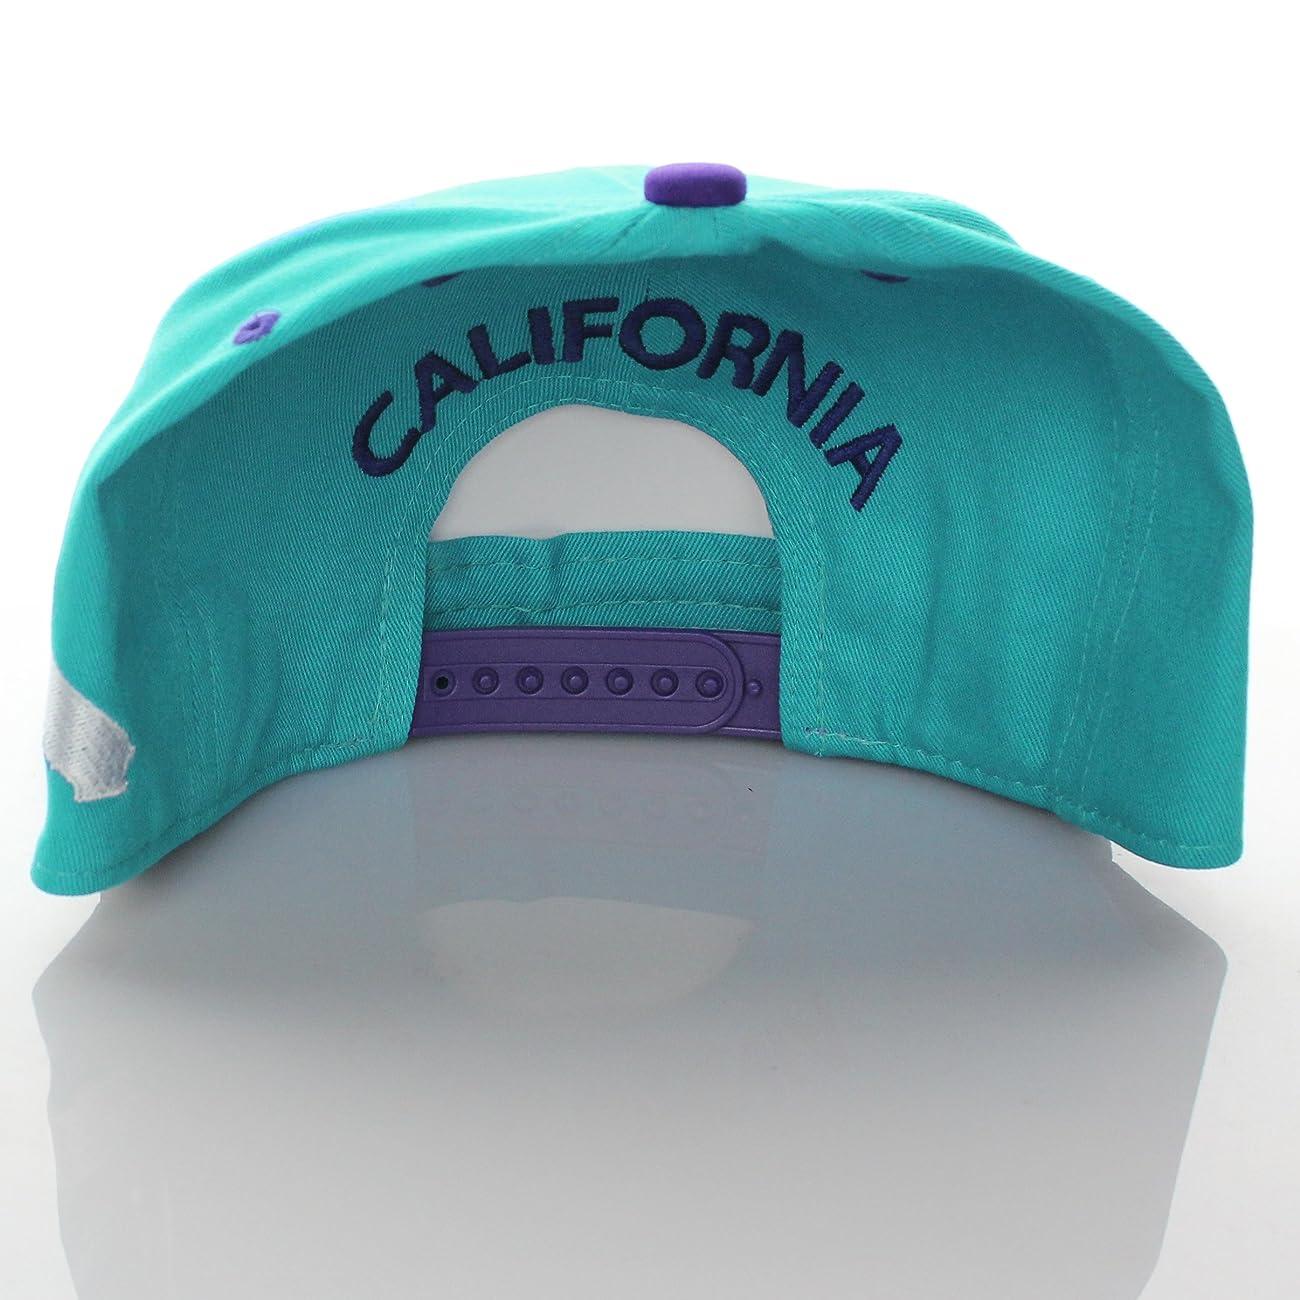 California Republic Flat Bill Vintage Style Snapback Hat Cap 3